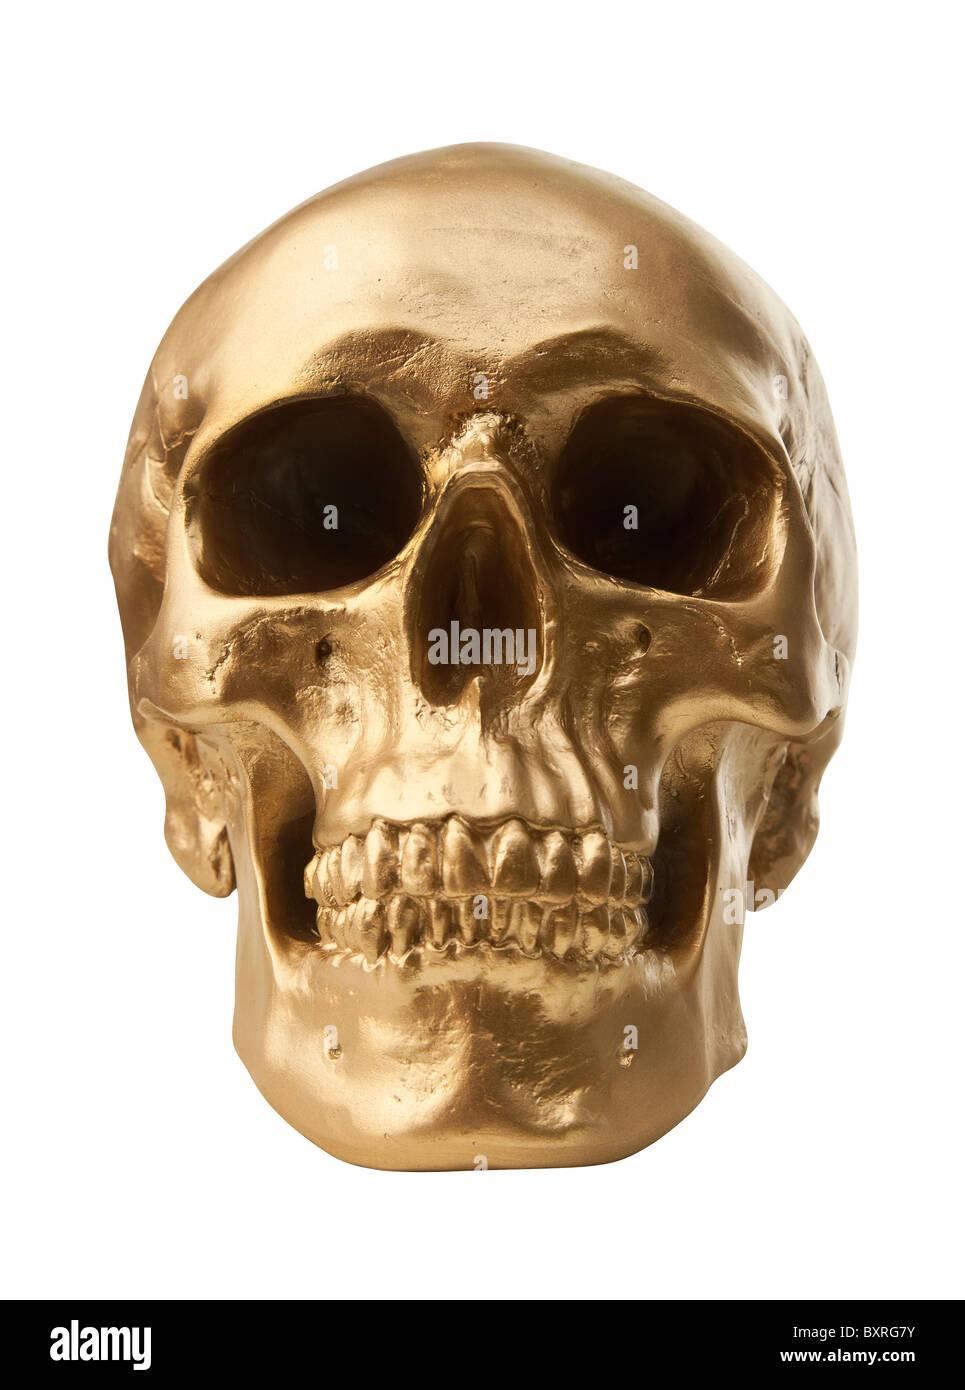 Golden human skull isolated on white background Stock Photo